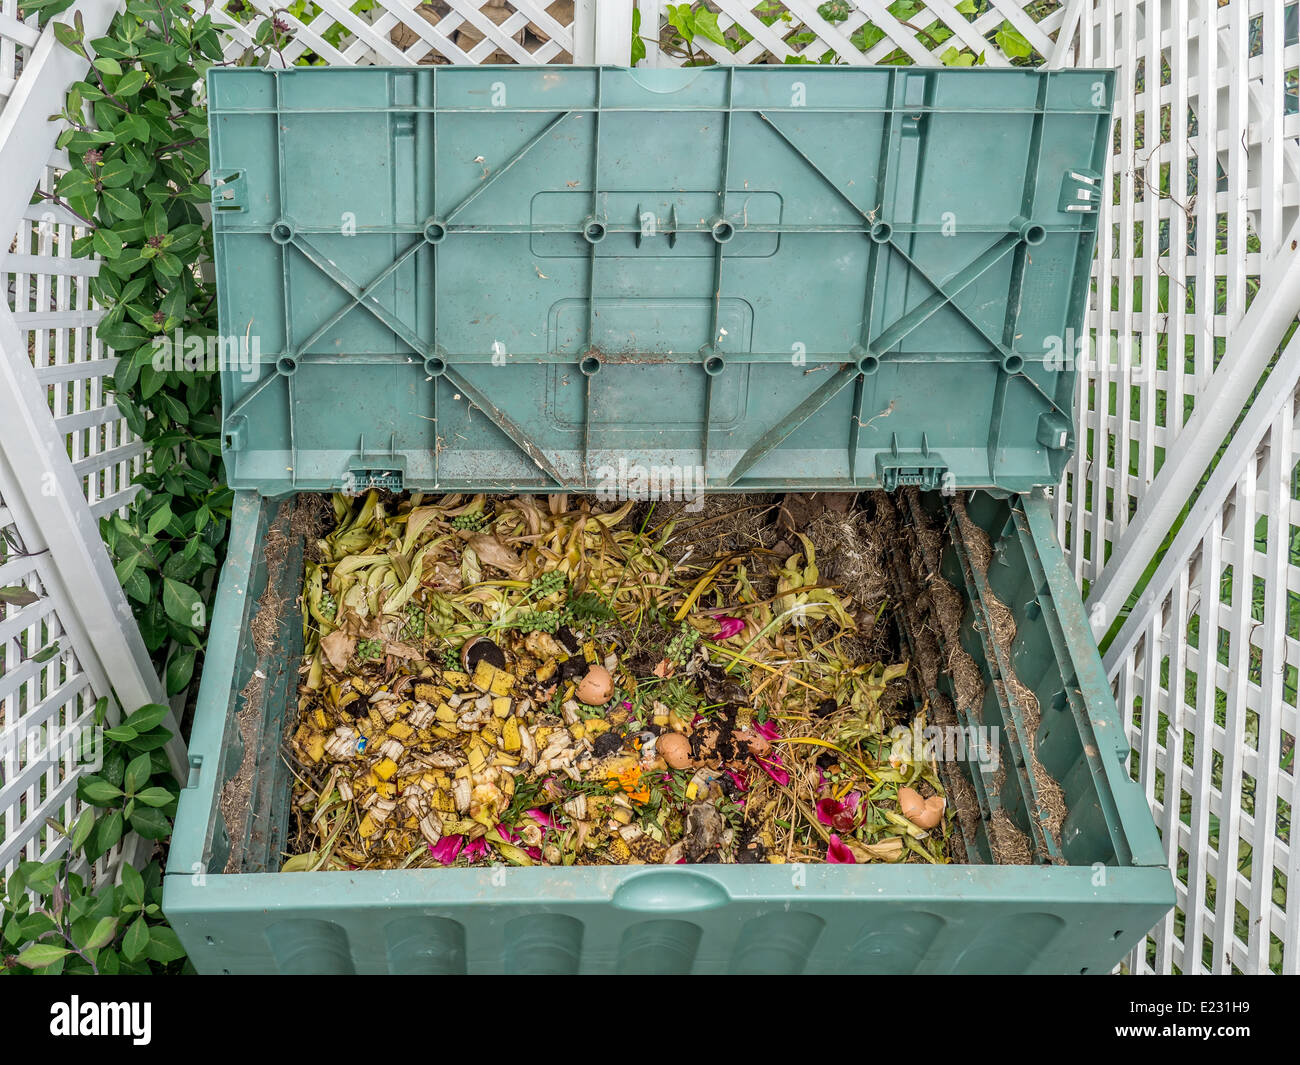 Organic Waste Plant Stock Photos & Organic Waste Plant Stock Images ...